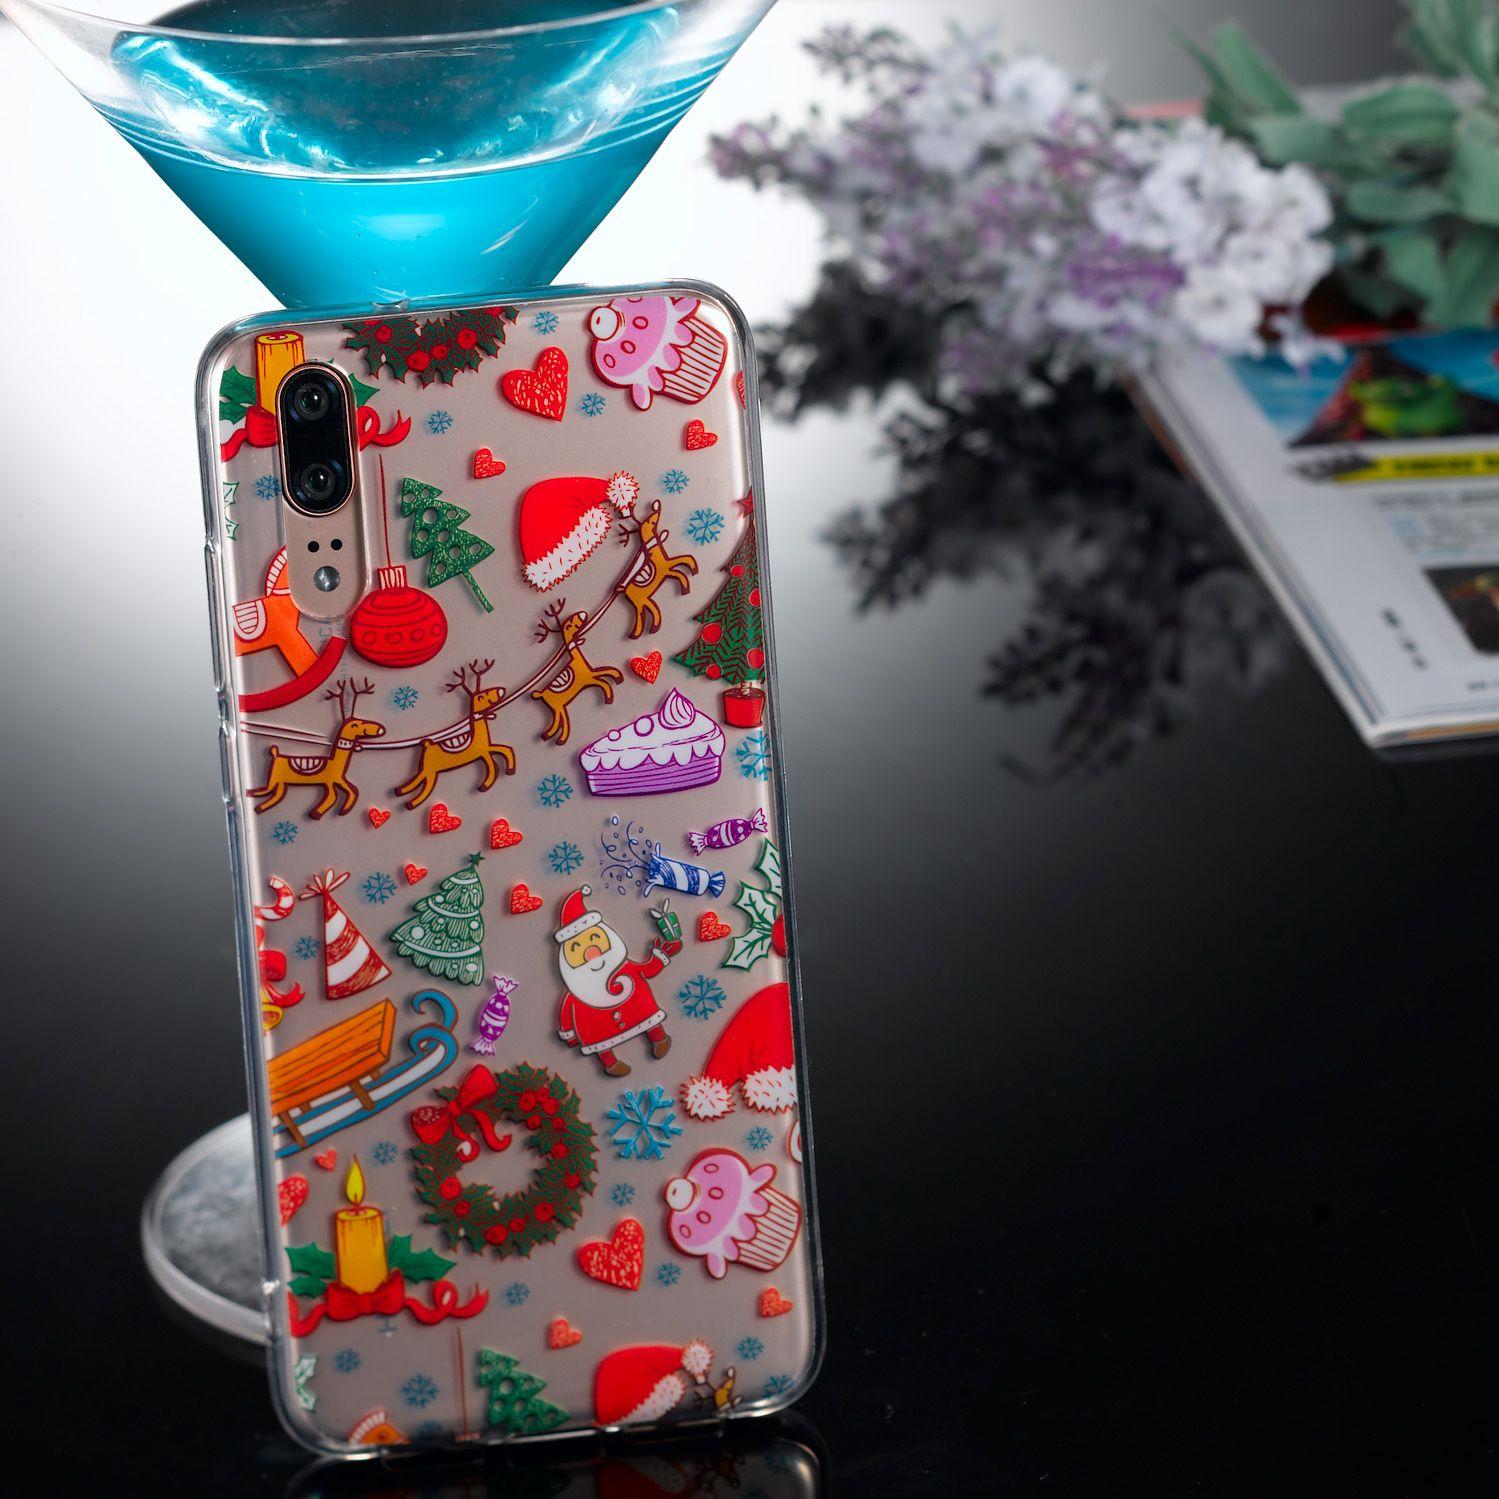 TPU Protective Phone Cover Soft Cute Cartoon Christmas Style Shell for Huawei P20